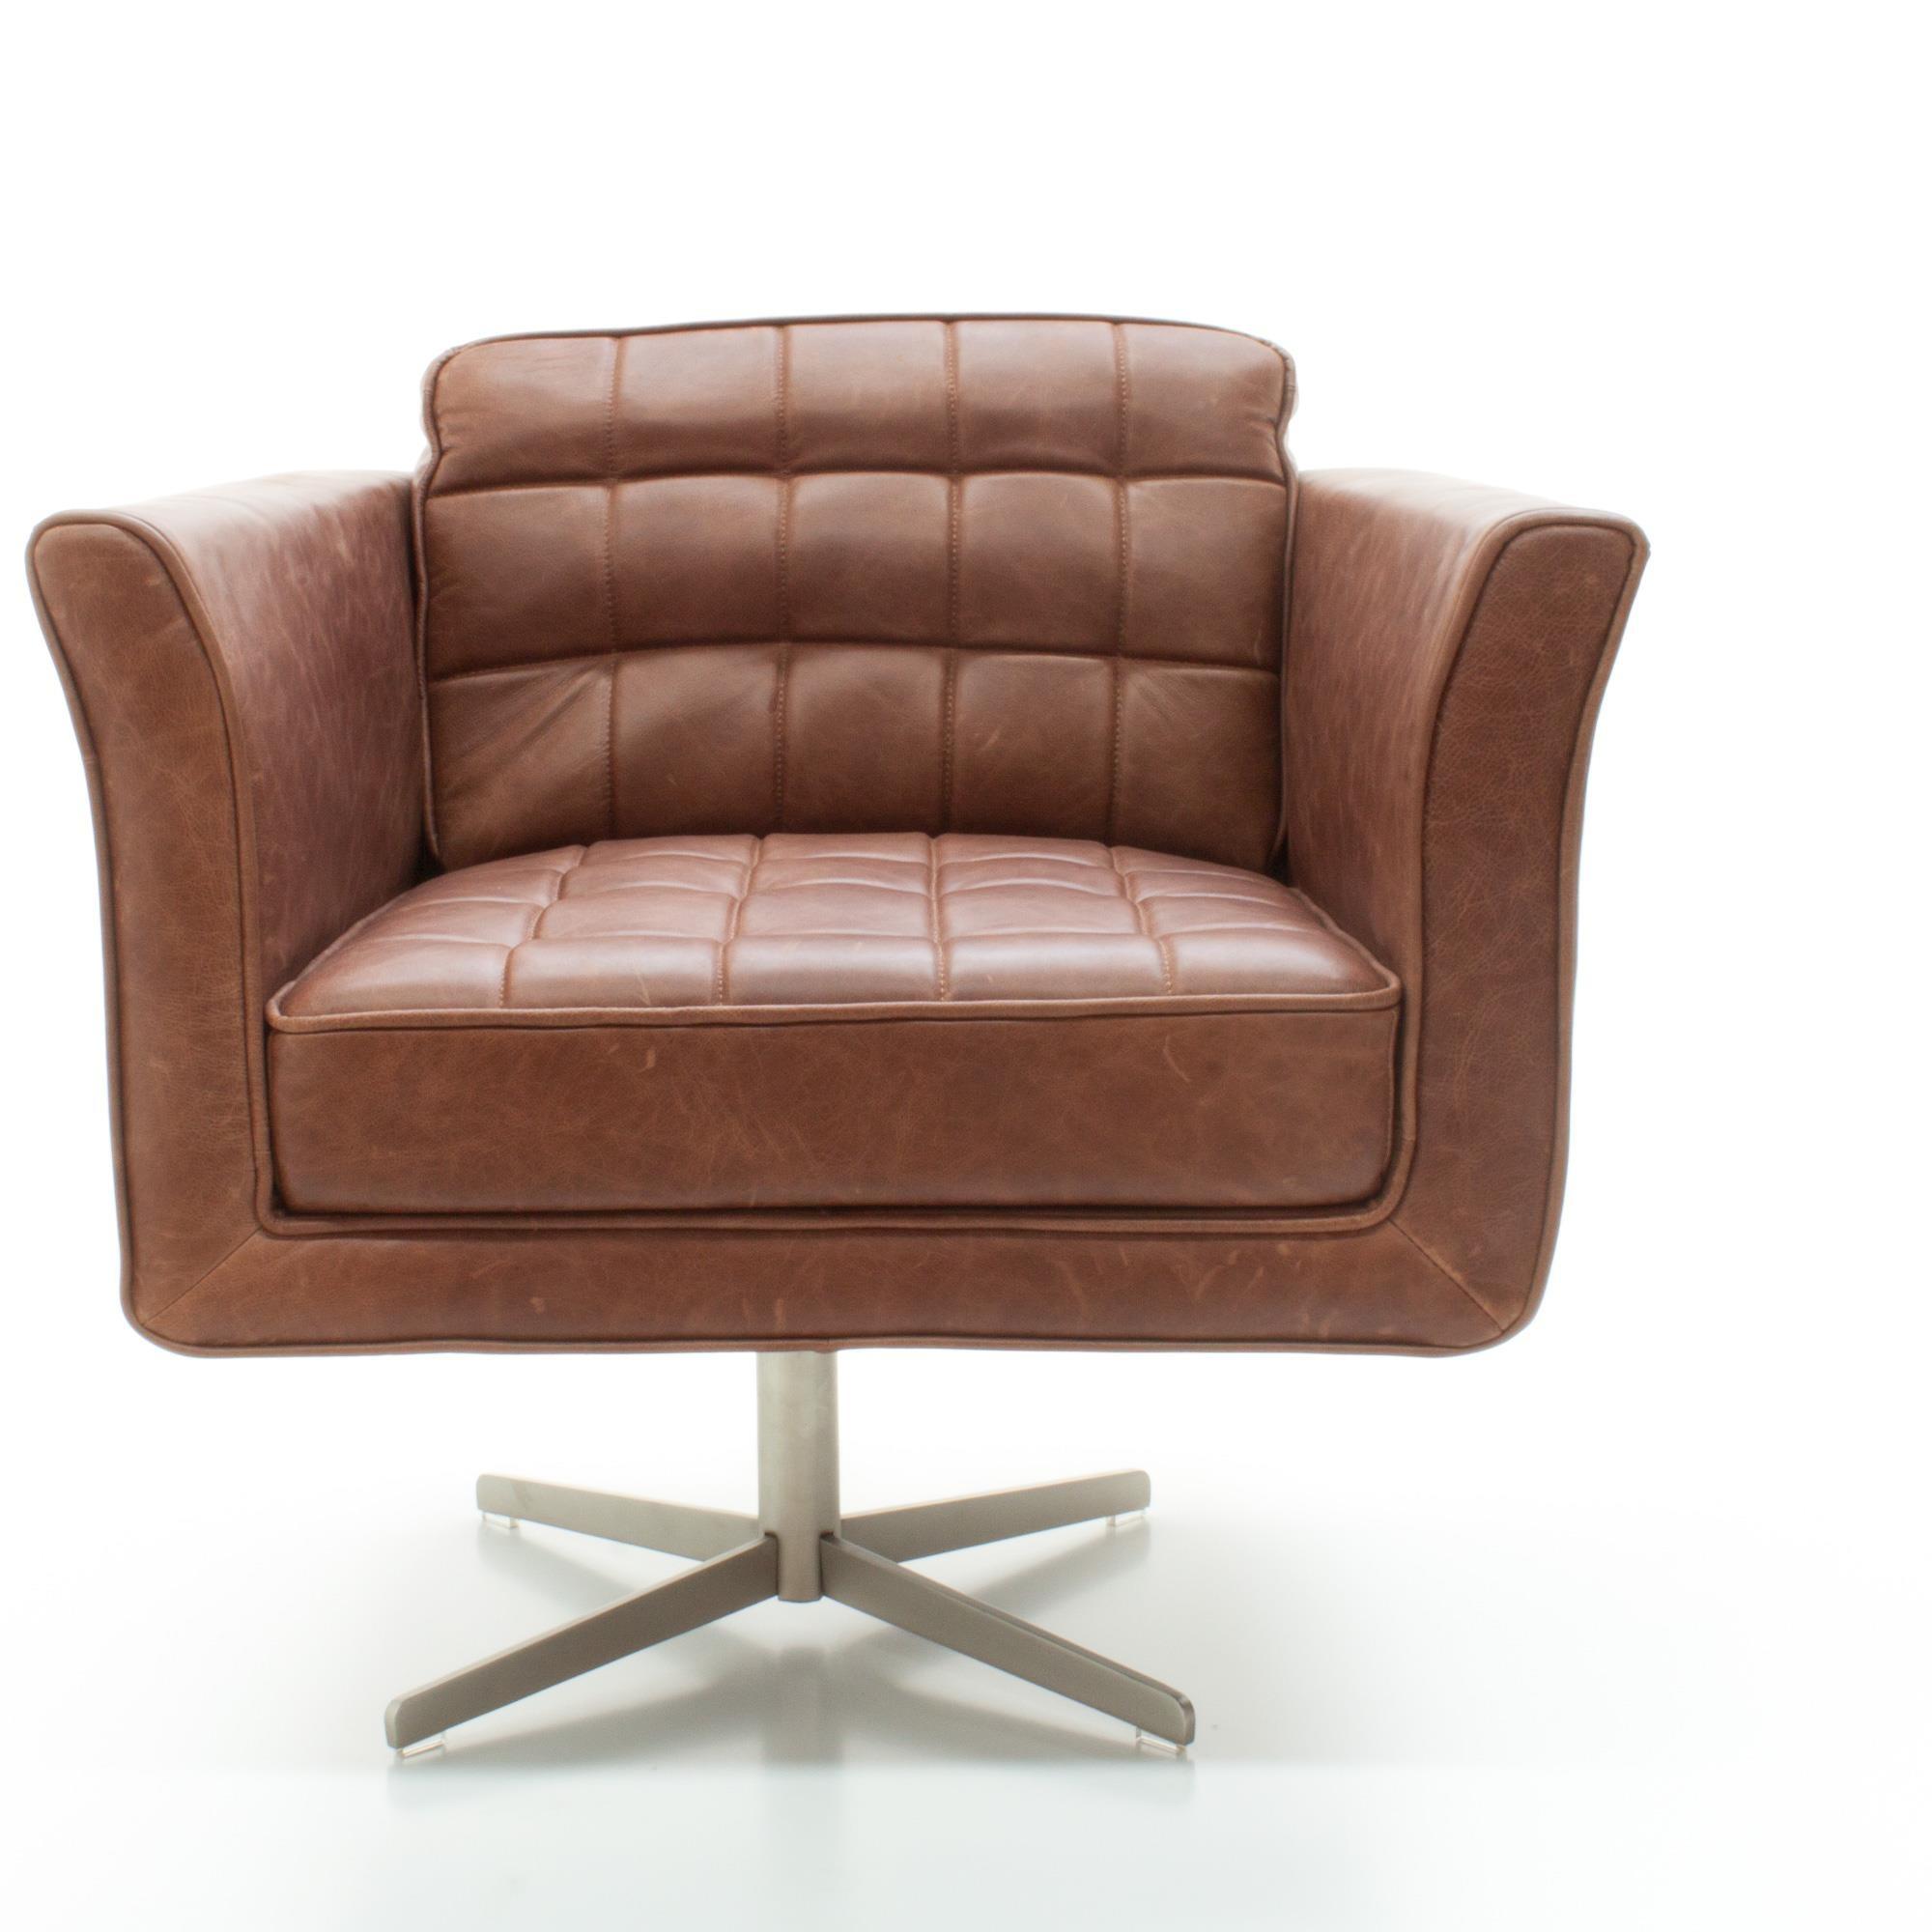 ledersessel bologna englisch braun. Black Bedroom Furniture Sets. Home Design Ideas